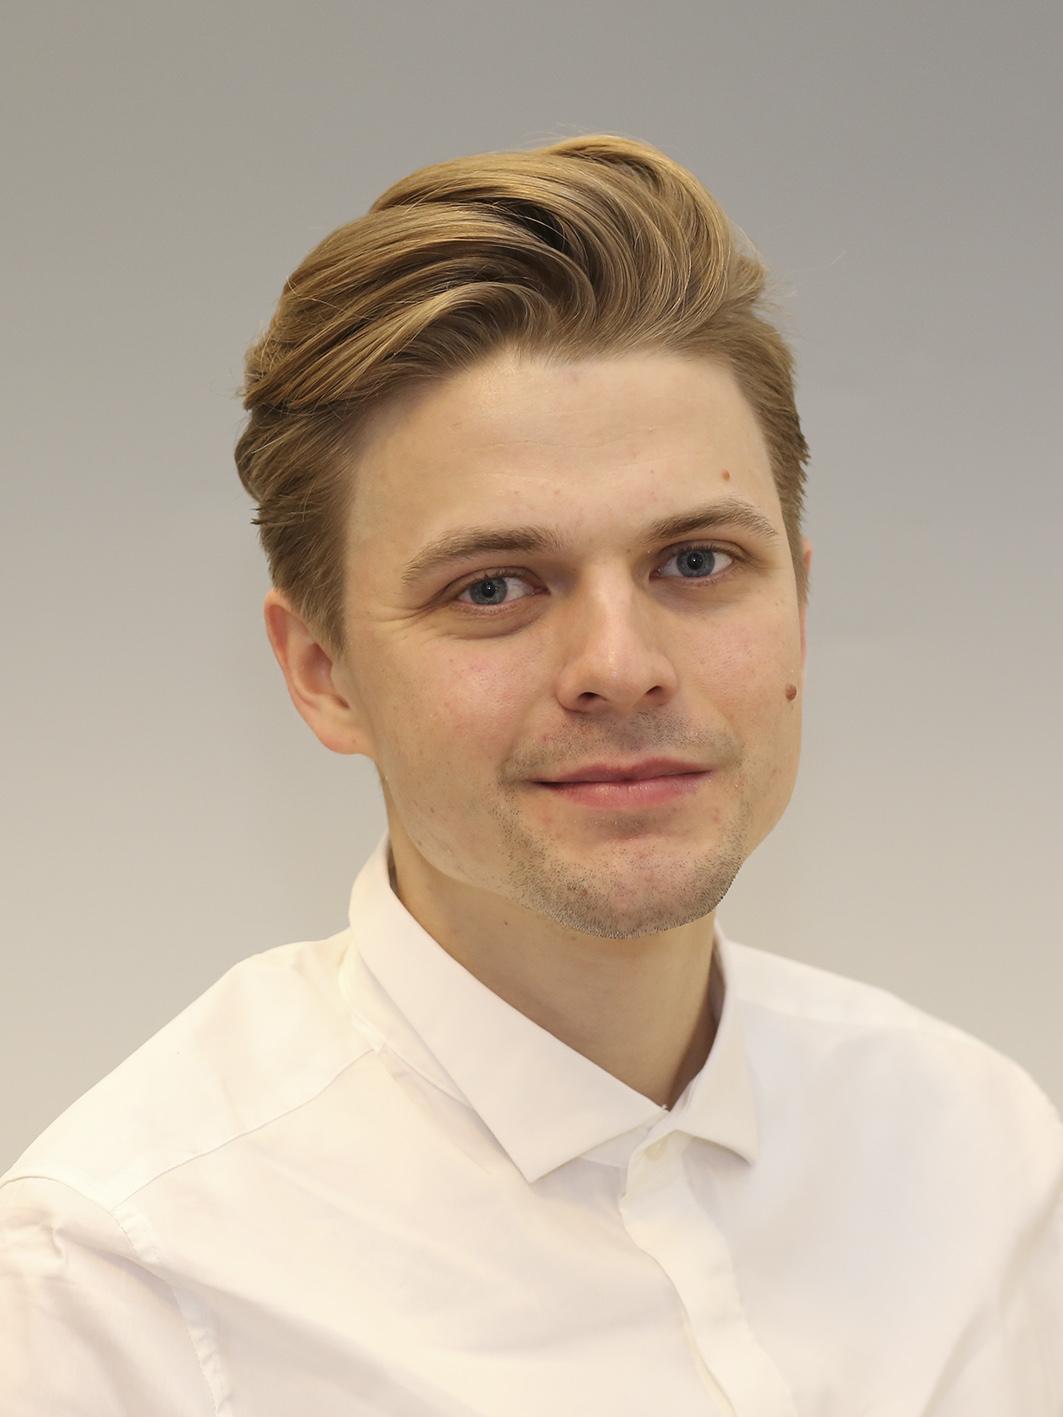 Rasmus Skytte